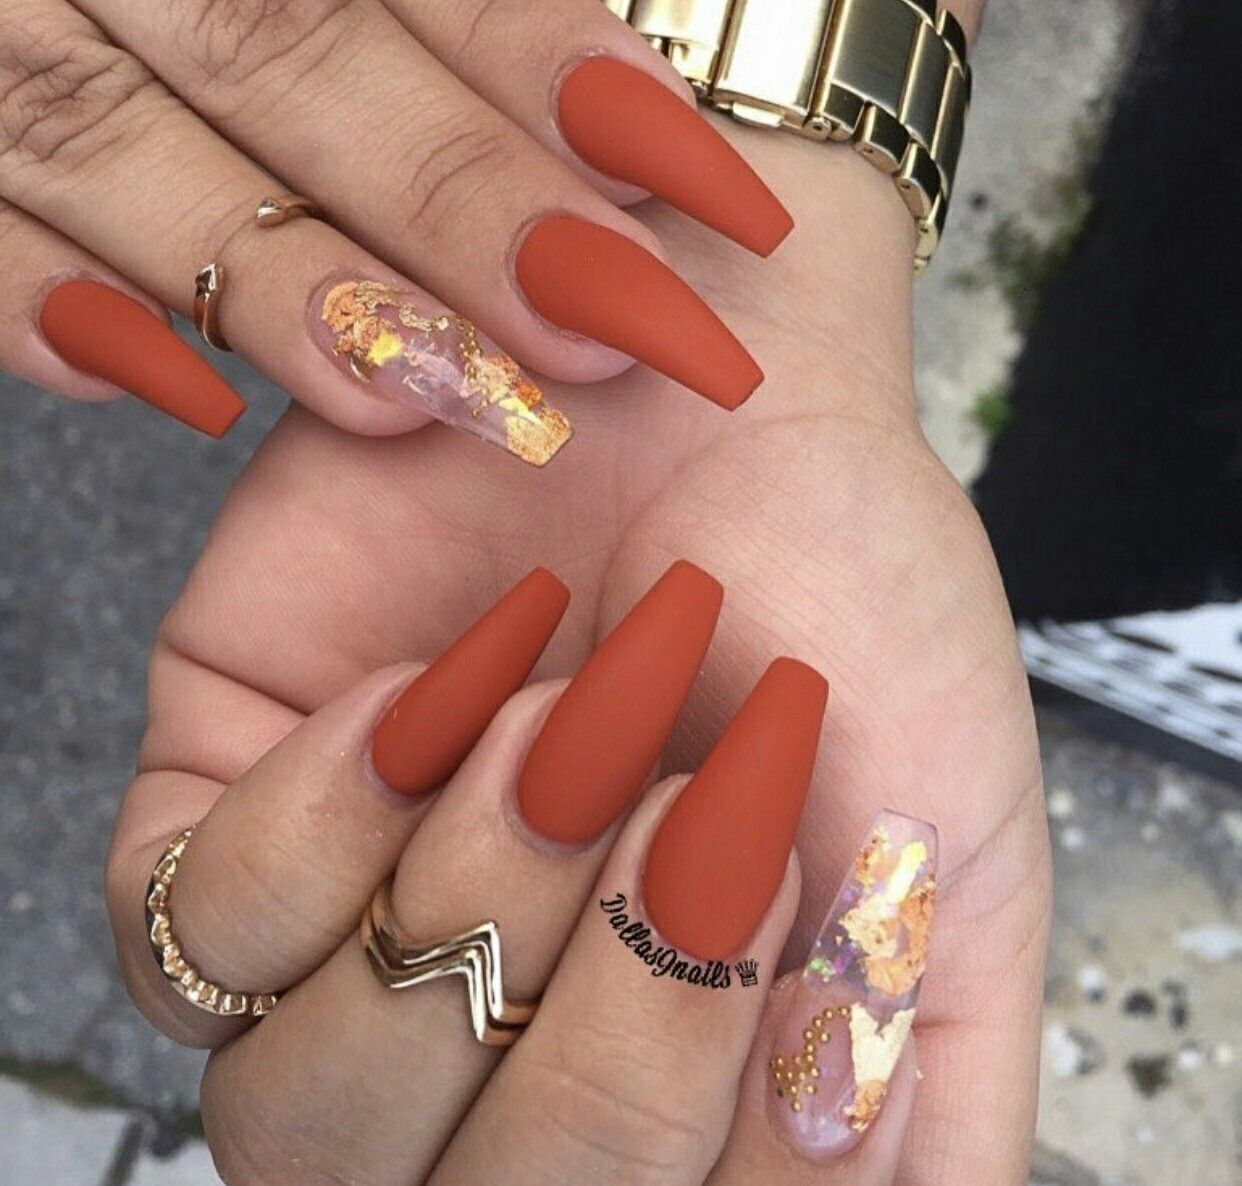 baddestbbylexx | nails. | Pinterest | Snapchat, Nail inspo and Nail nail